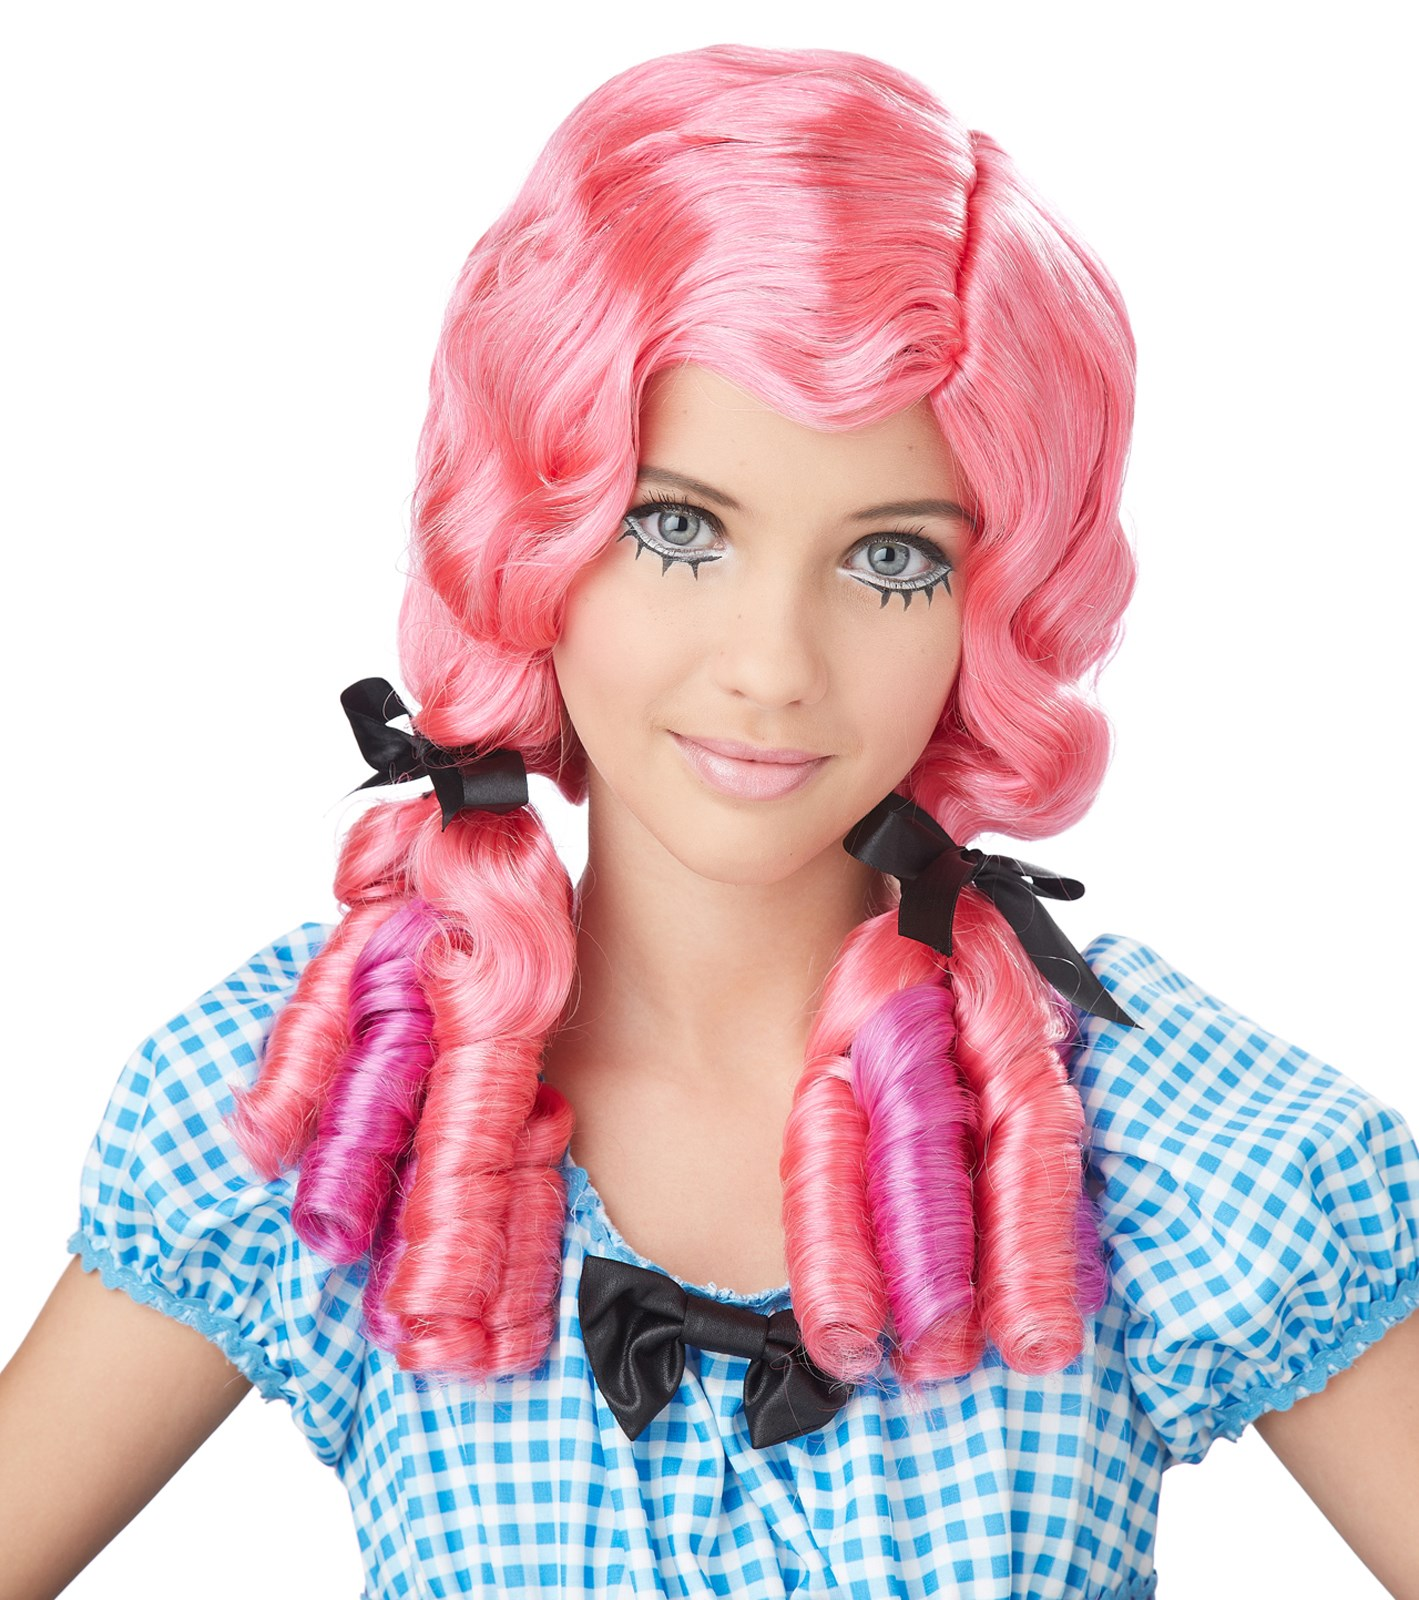 Adult Doll Curls Wig - Coral/Magenta